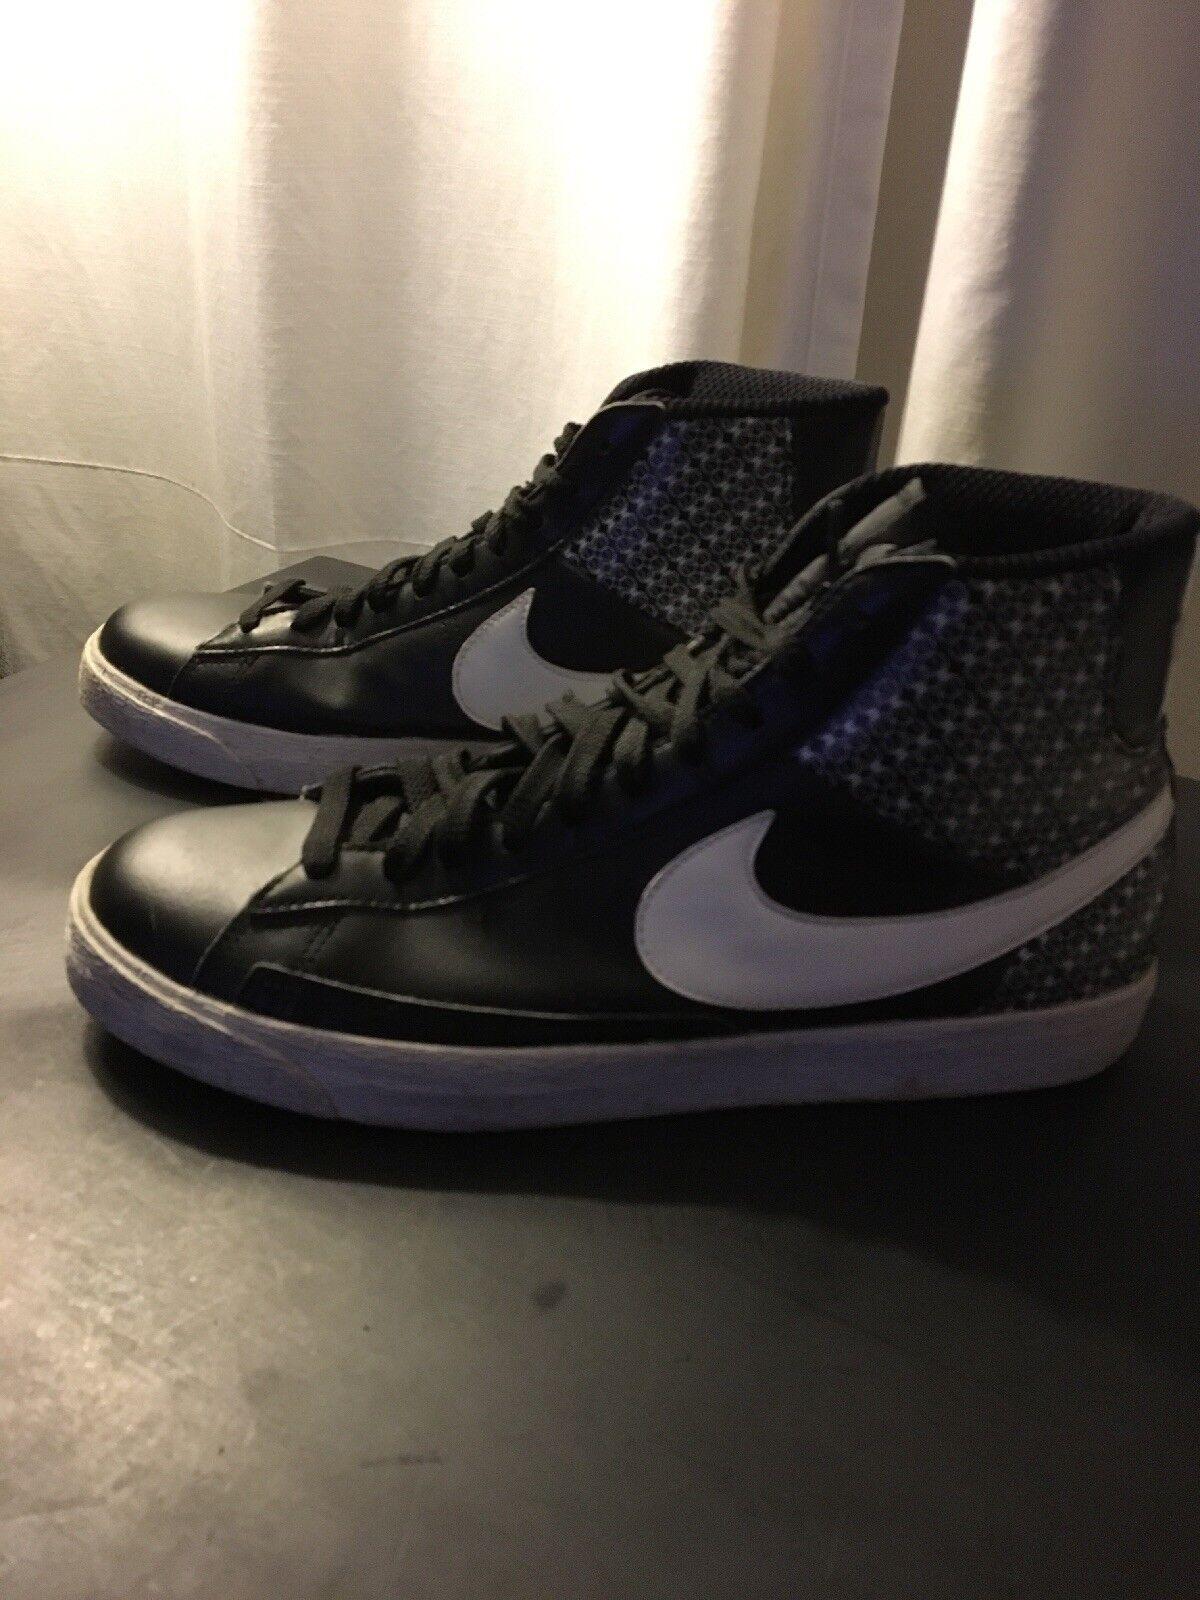 Nike Nike Nike Blazer Hi-Top Black/White Size 11 379416-011 f17c18